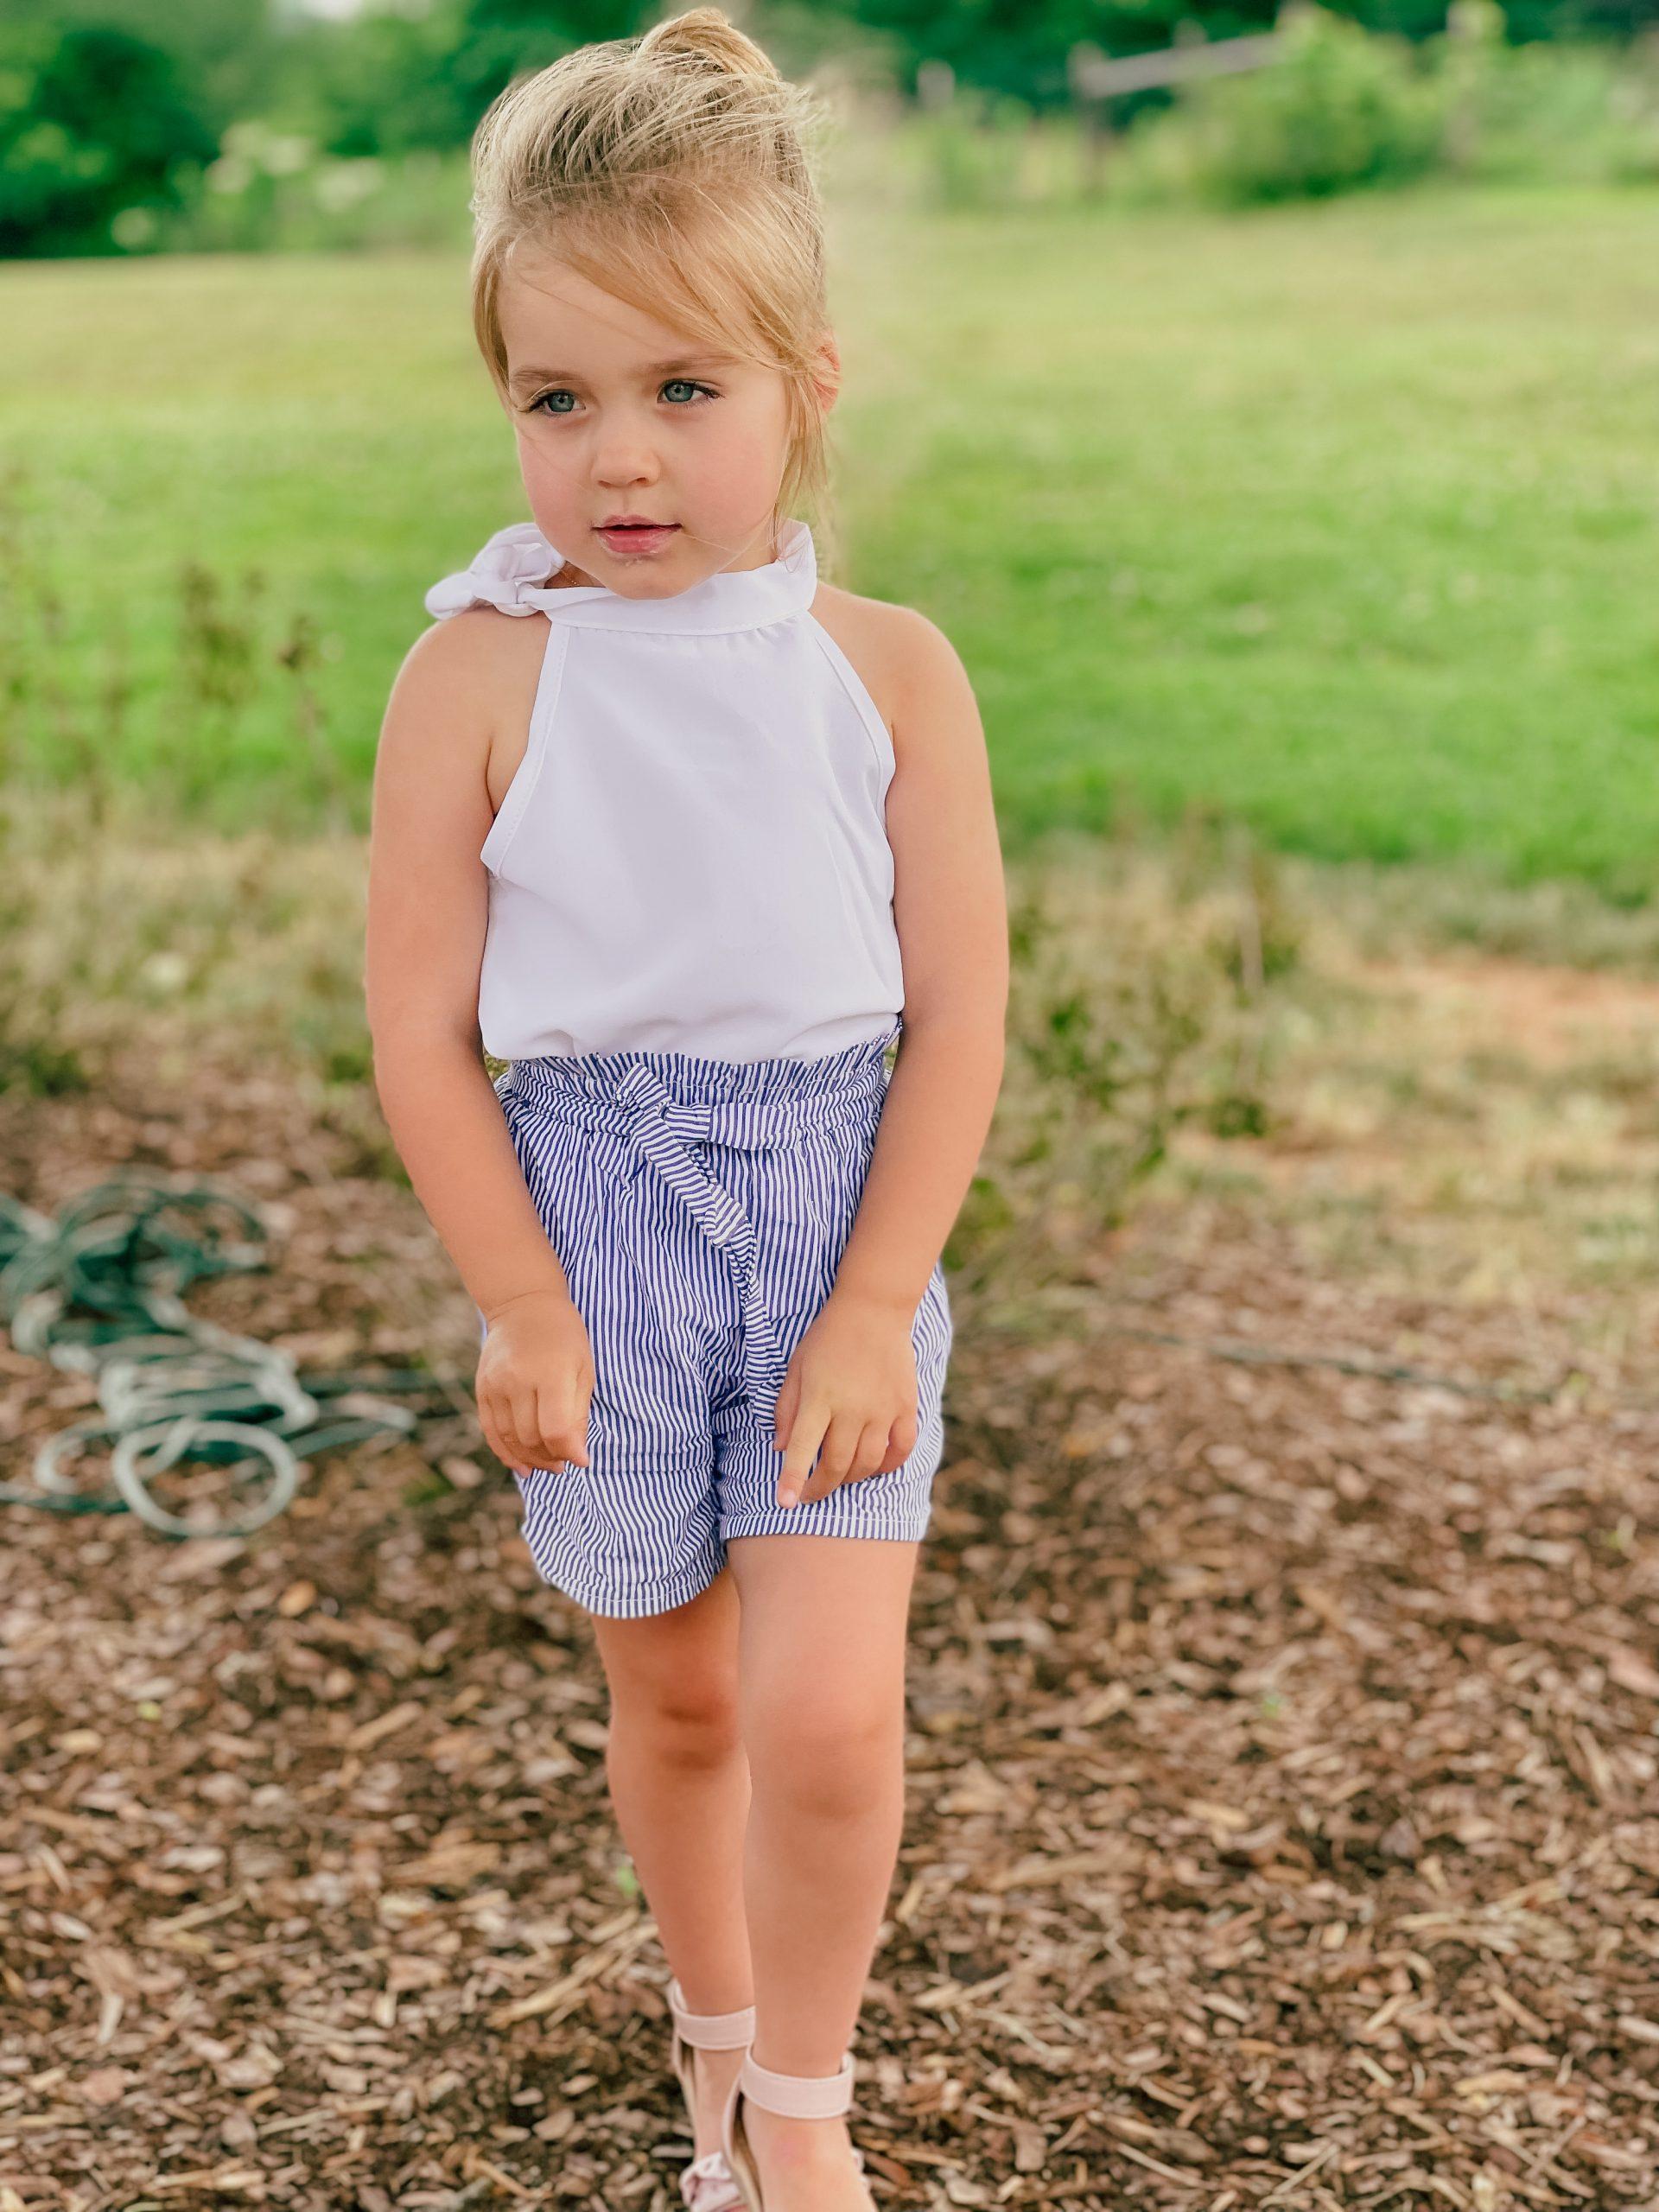 Nash Family Creamery Chapel Hill, TN MacKenlee Lanter amazon 3T outfit Angela Lanter